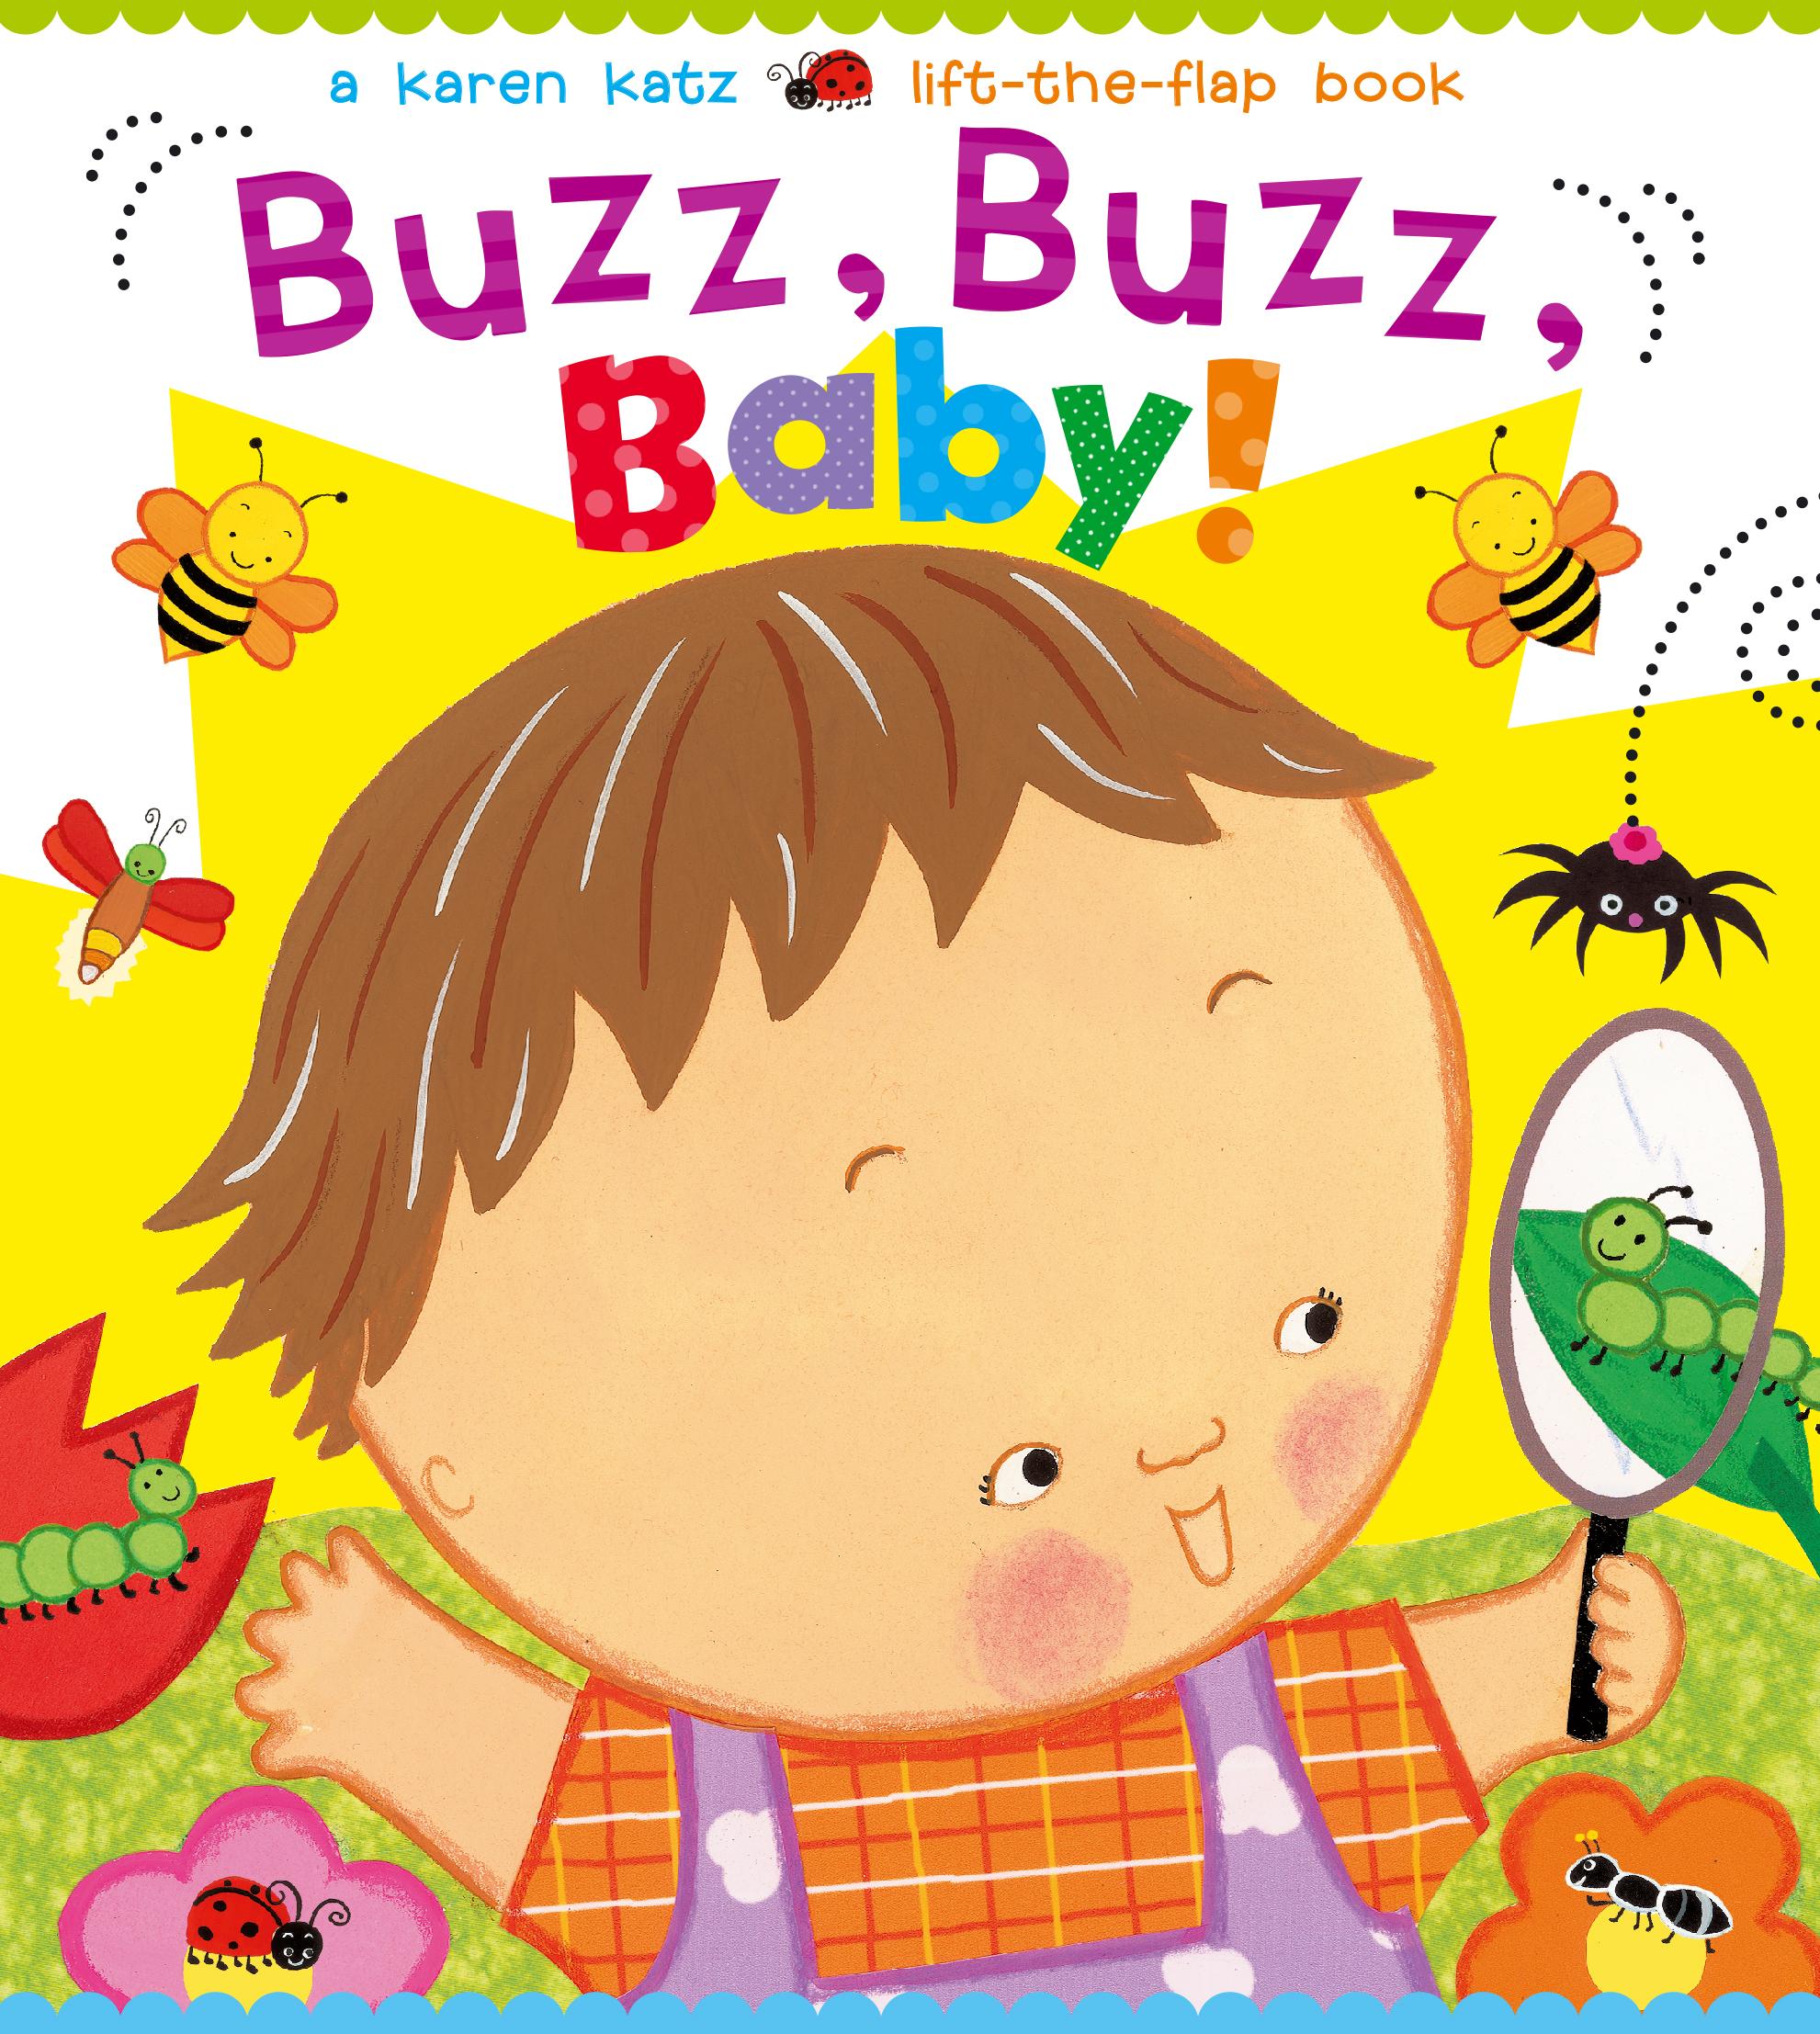 Buzz buzz baby! 9781442493131 hr